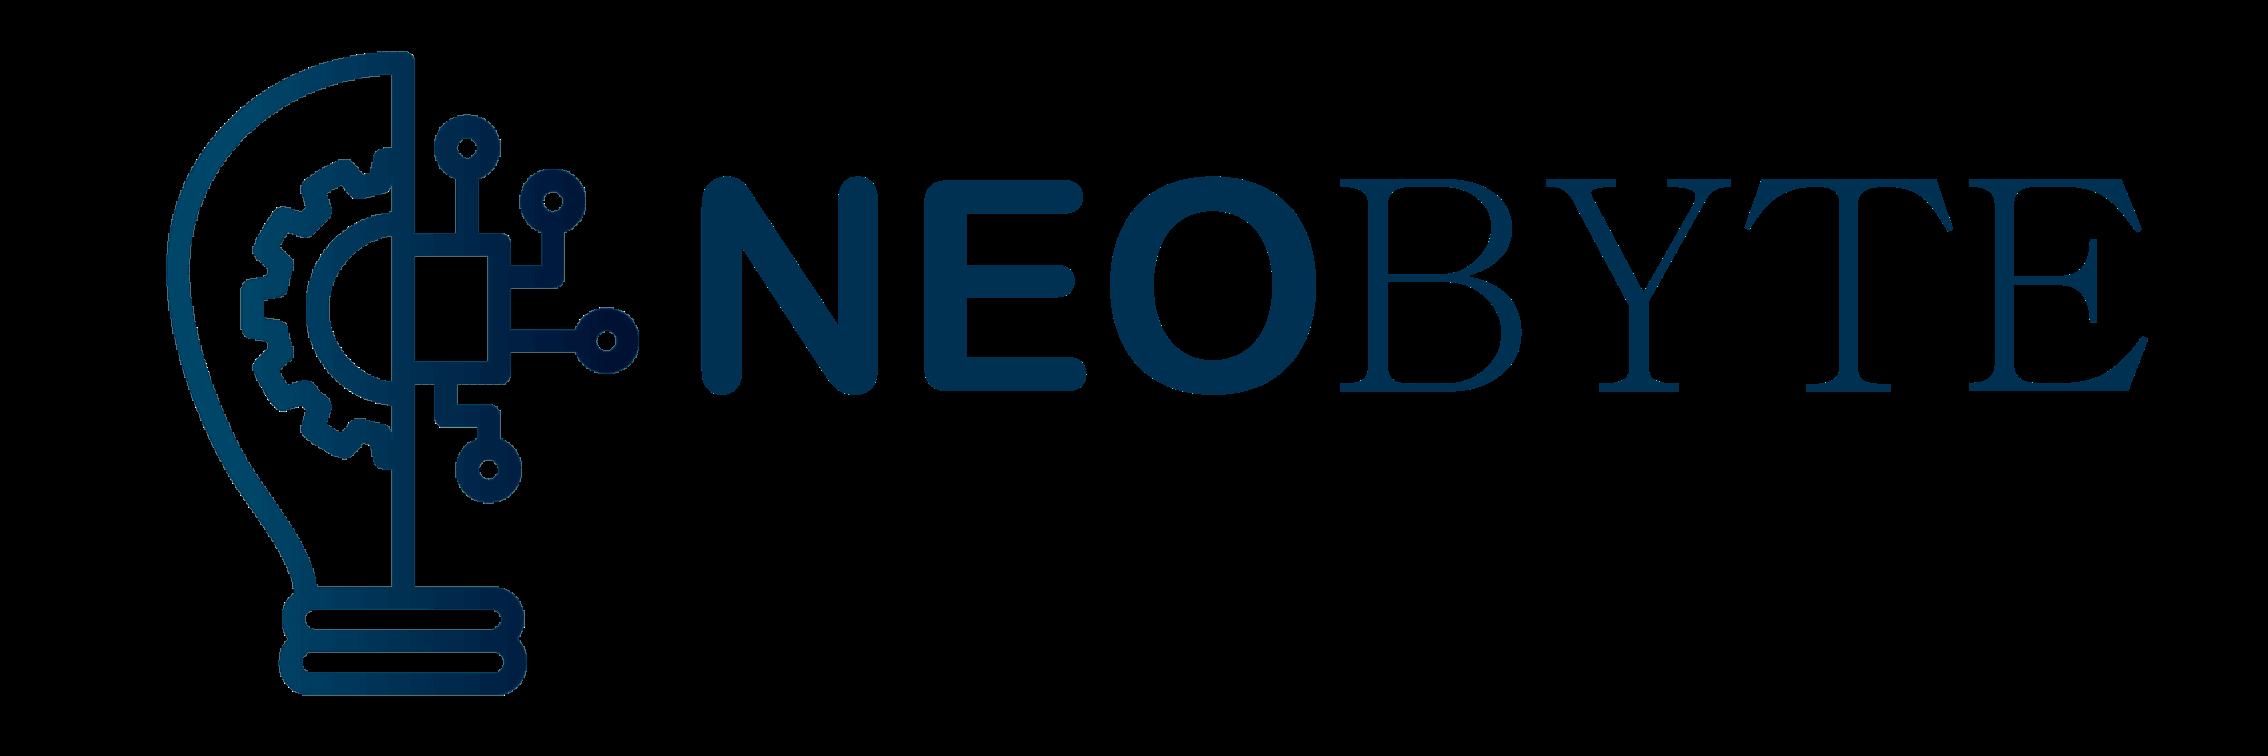 Neobyte Tienda Online